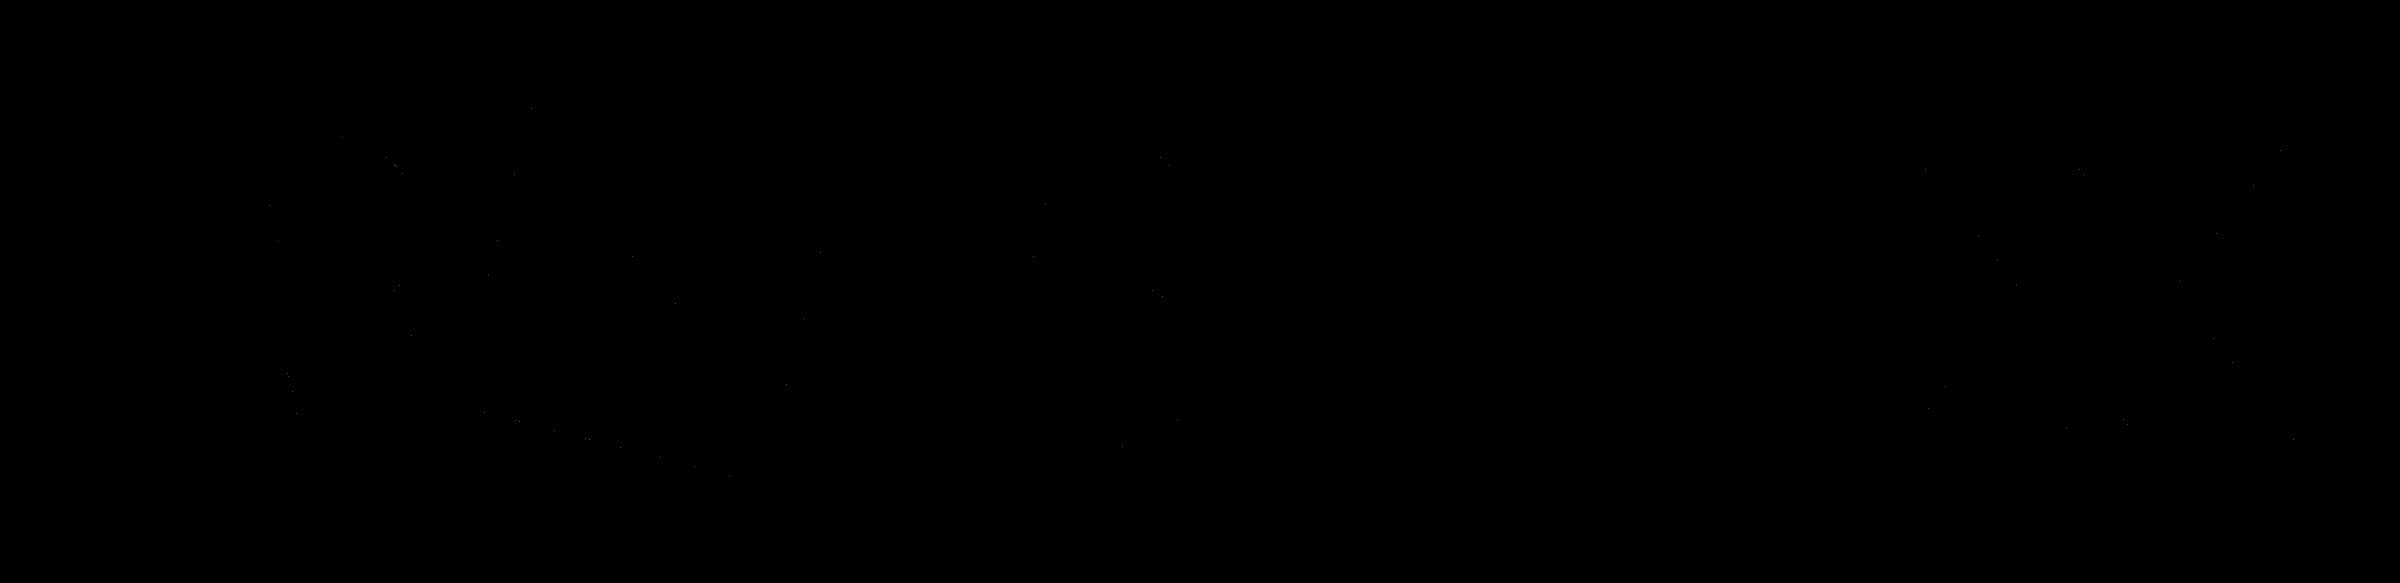 Roblox Logo Png Transparent Svg Vector Freebie Supply